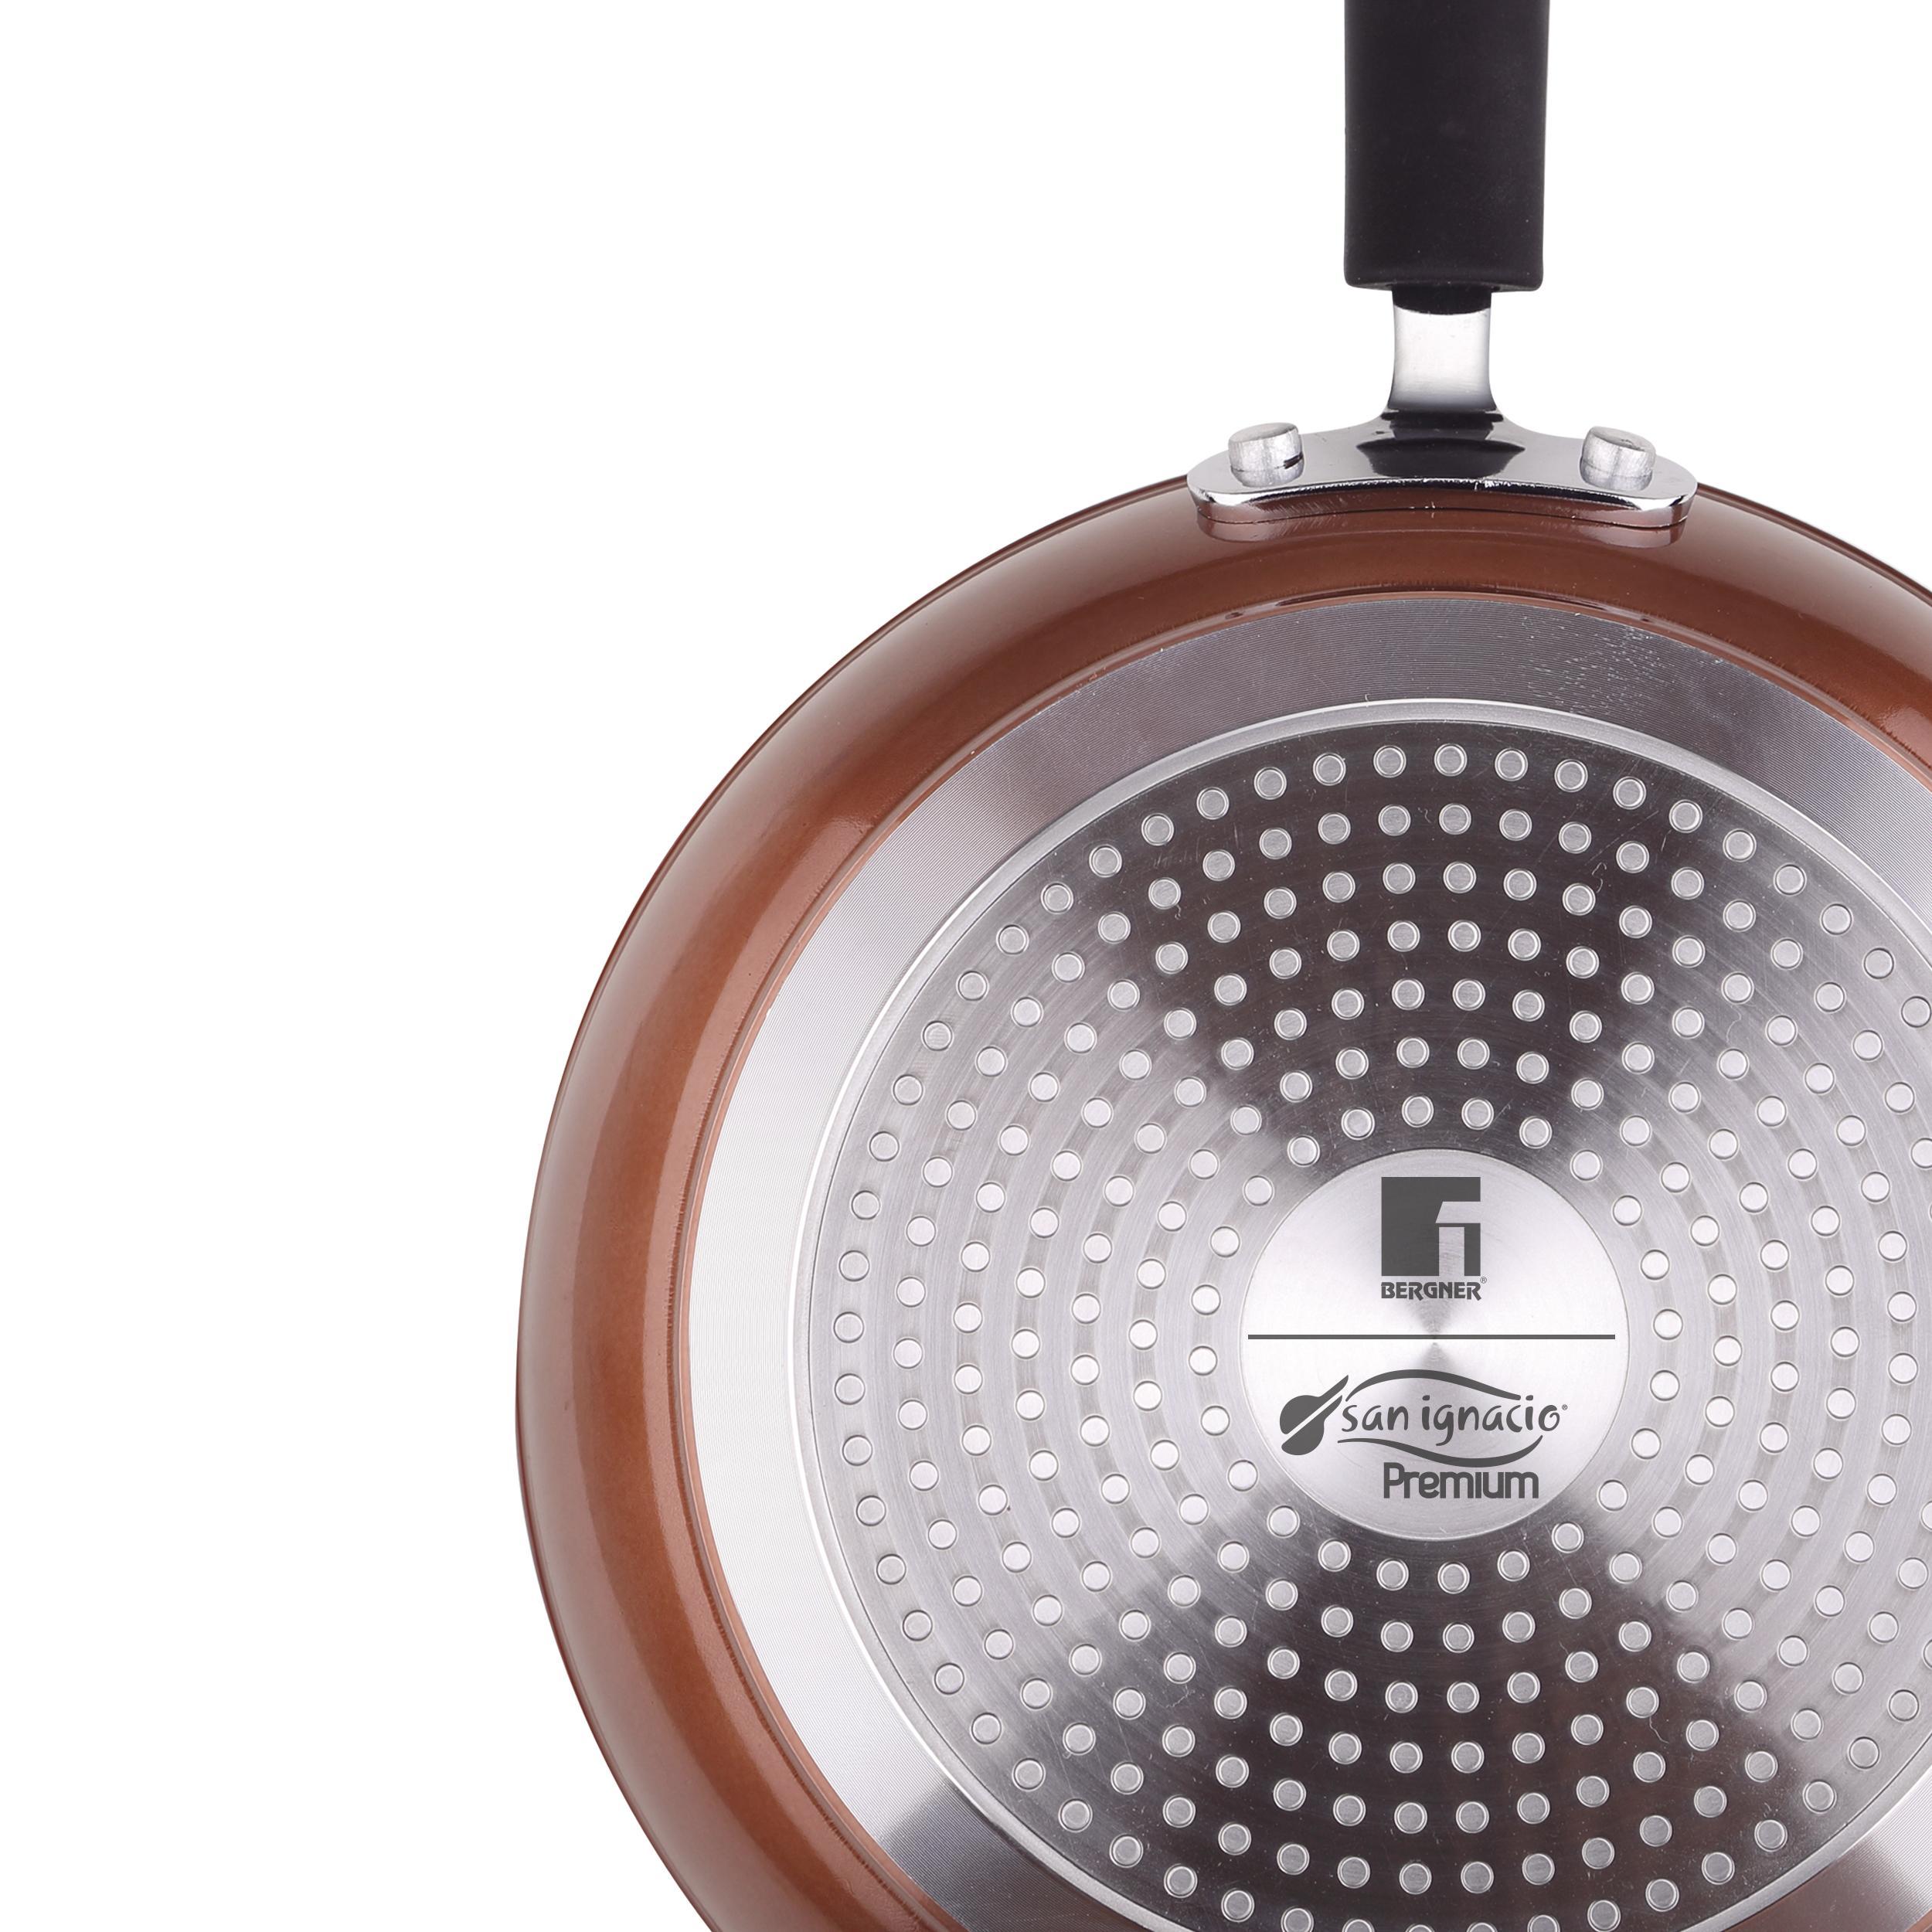 San Ignacio - Sartén Ø24 x 4,7 cms. aluminio forjado, color cobre metalizado, mango revestido con silicona, inducción